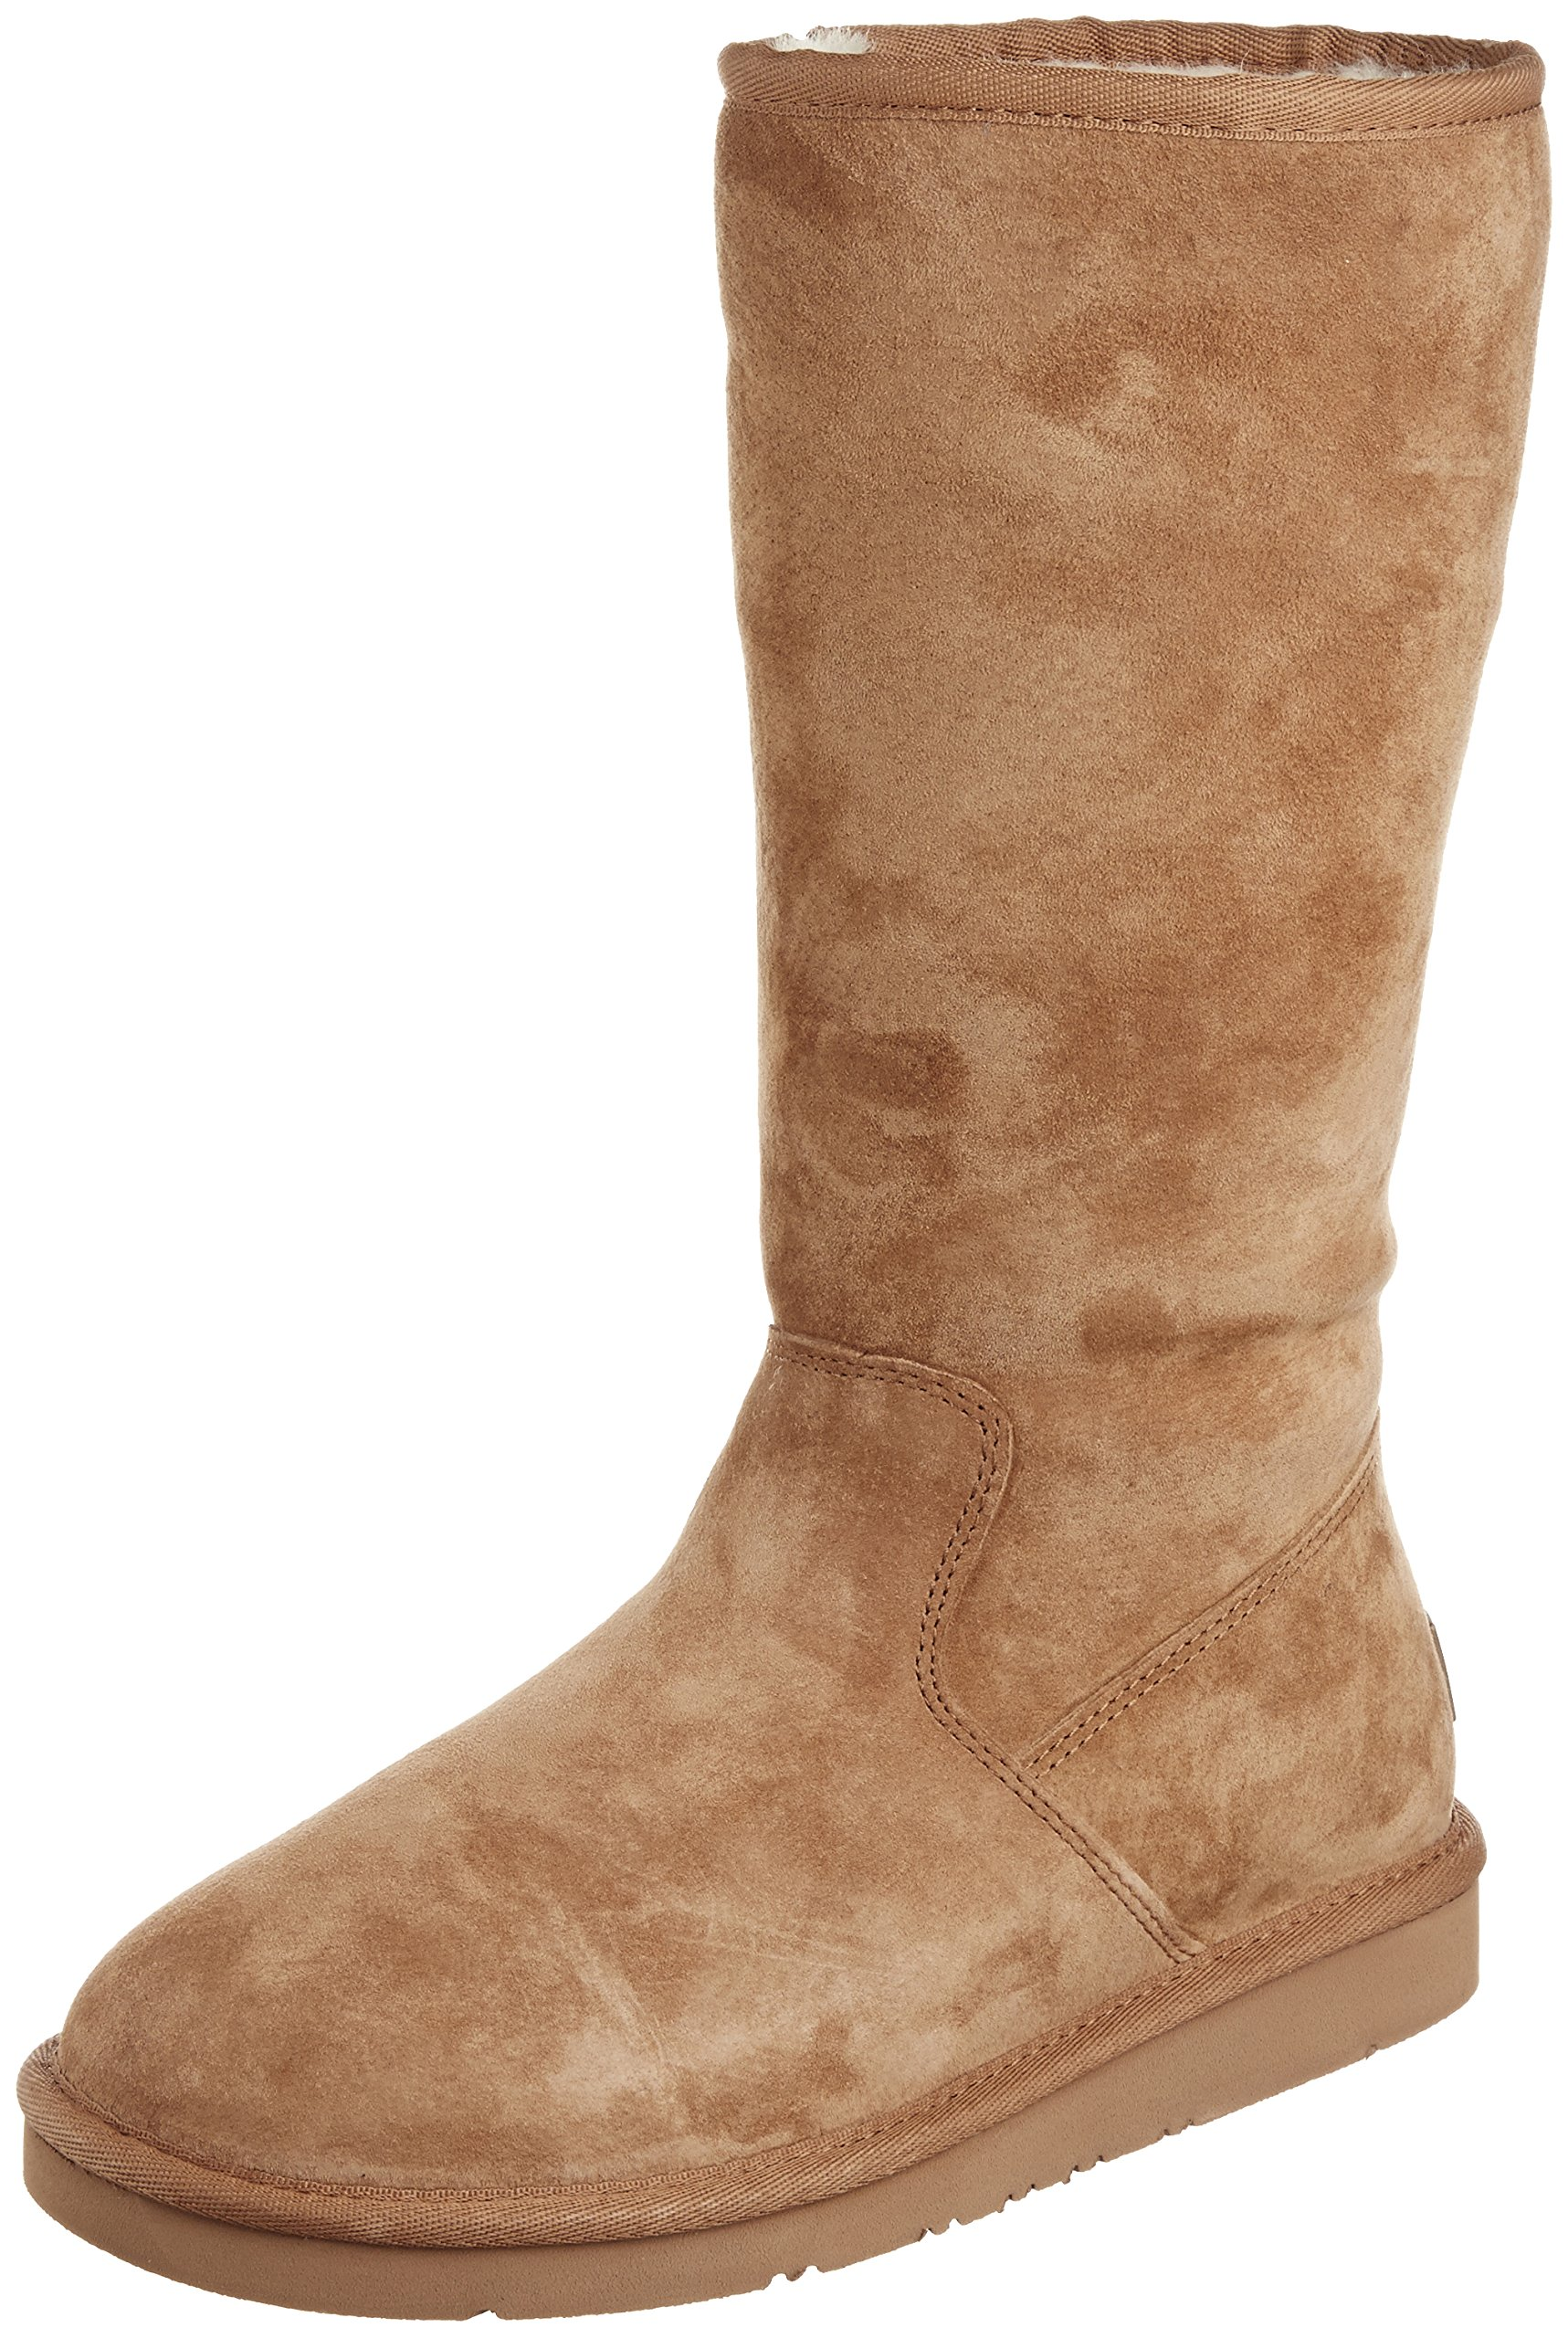 UGG Australia Womens Summer Boot Chestnut Size 6